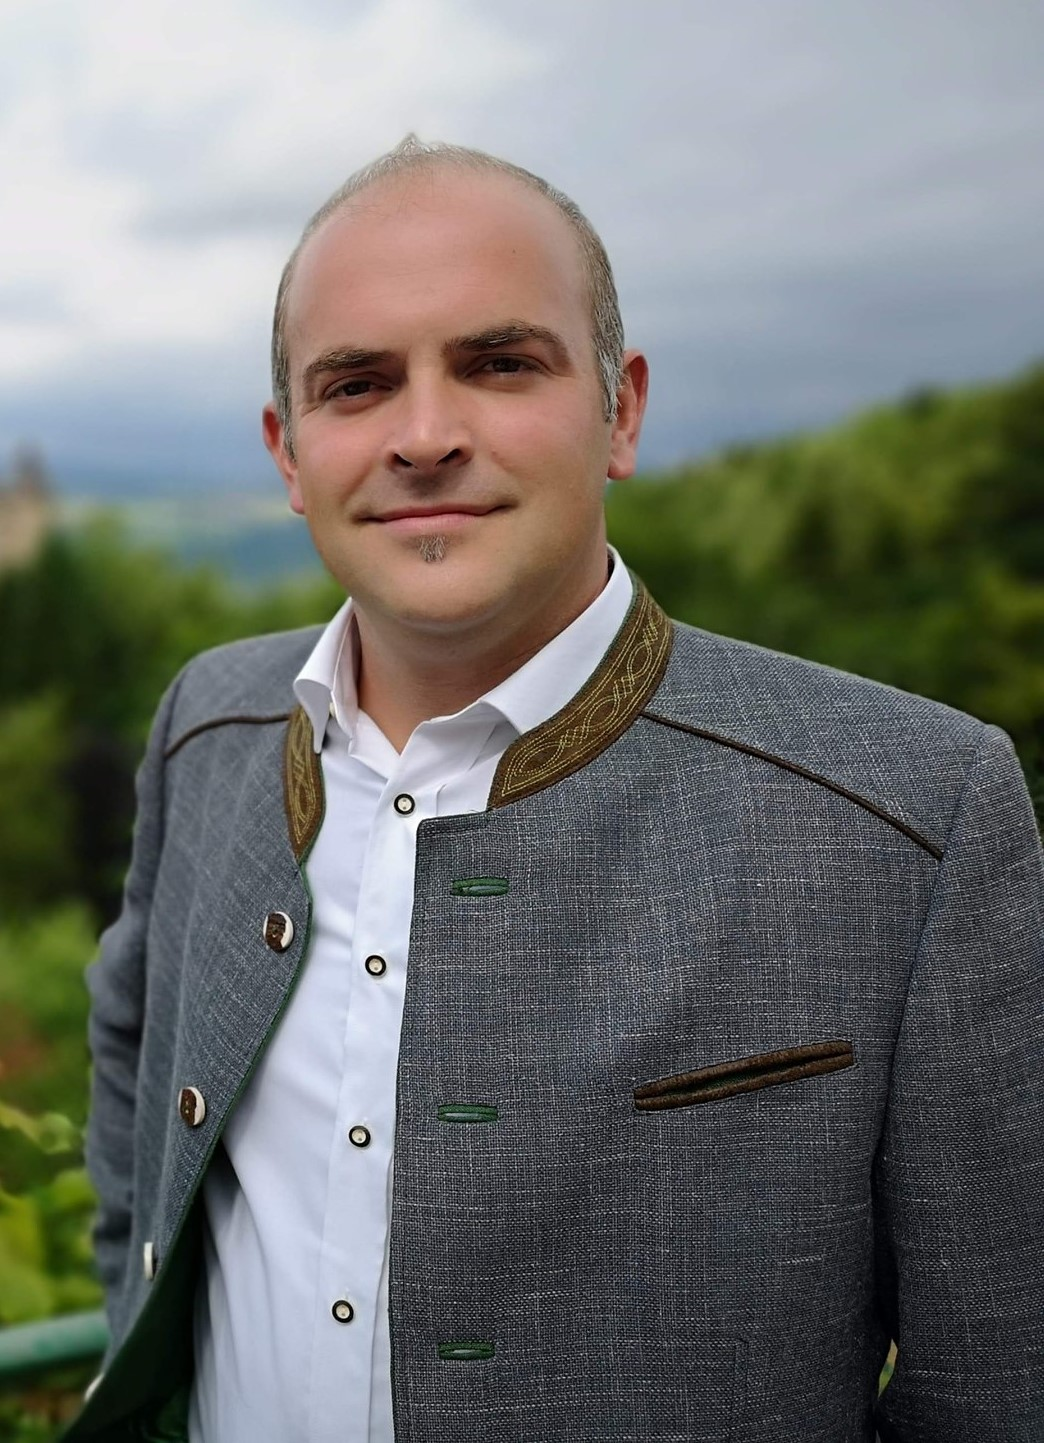 Andreas Moser